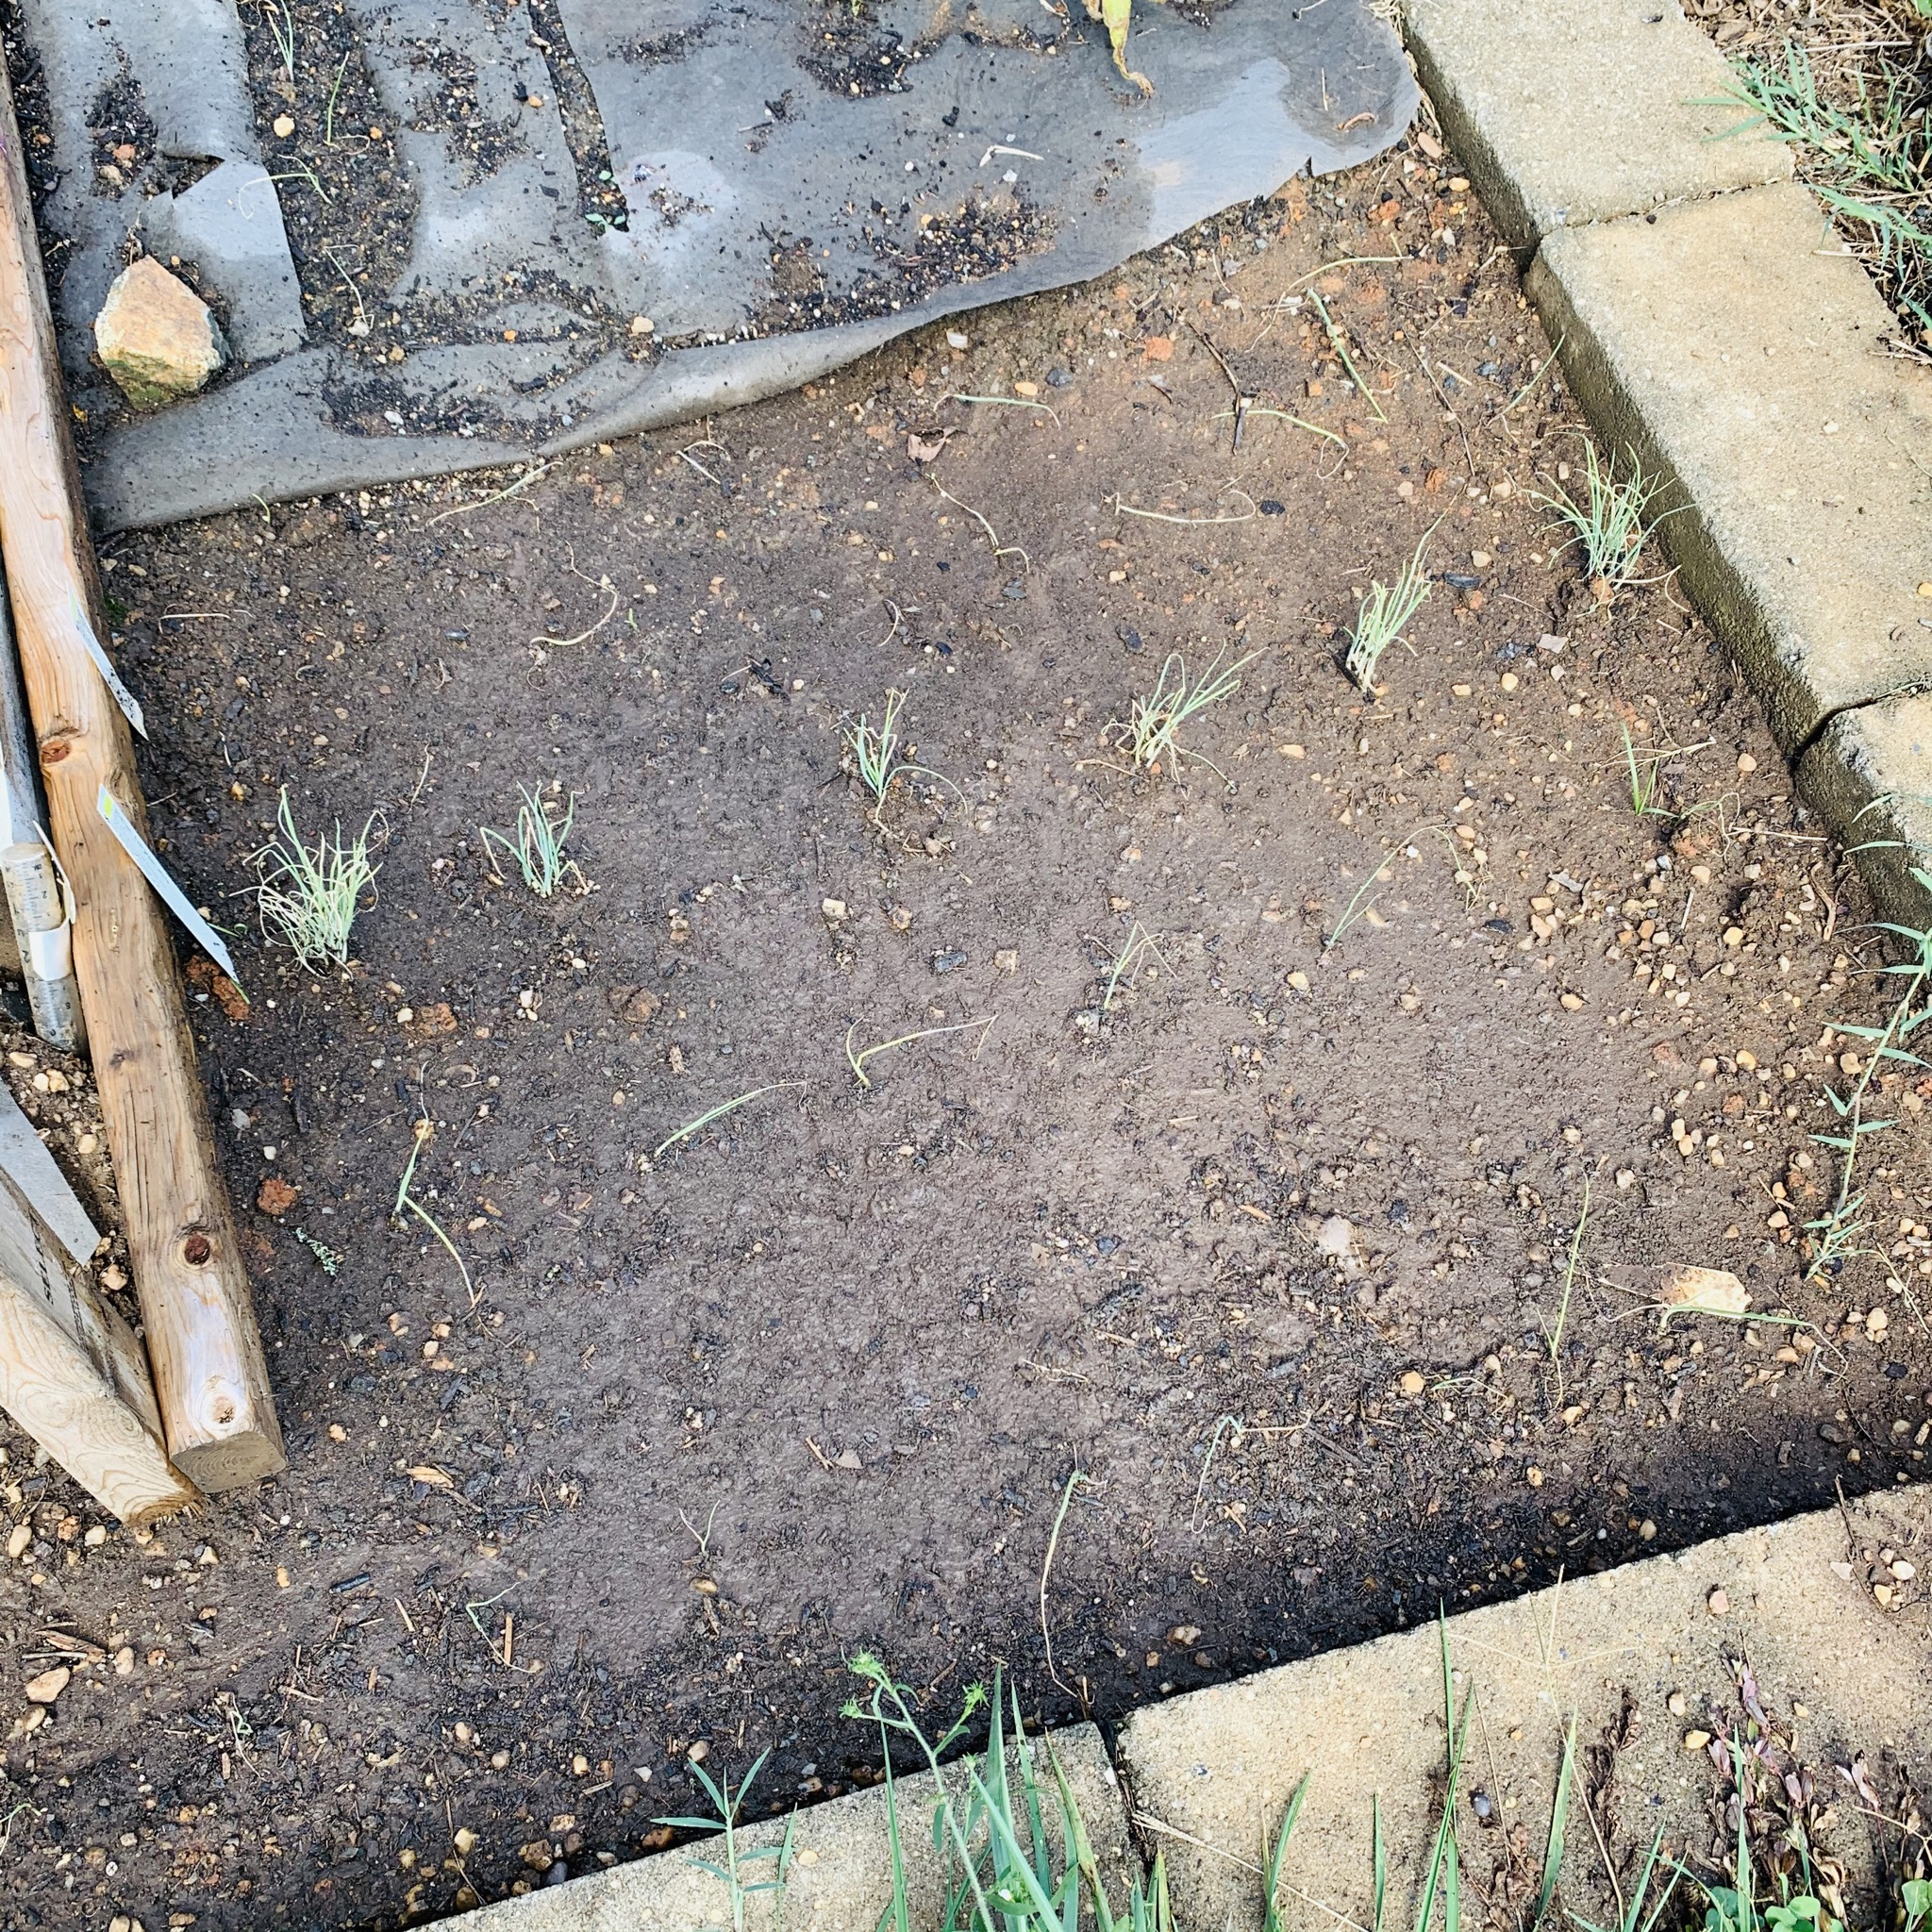 210017AE E4F6 4120 8107 EAEF12C53925 The garden is still producing